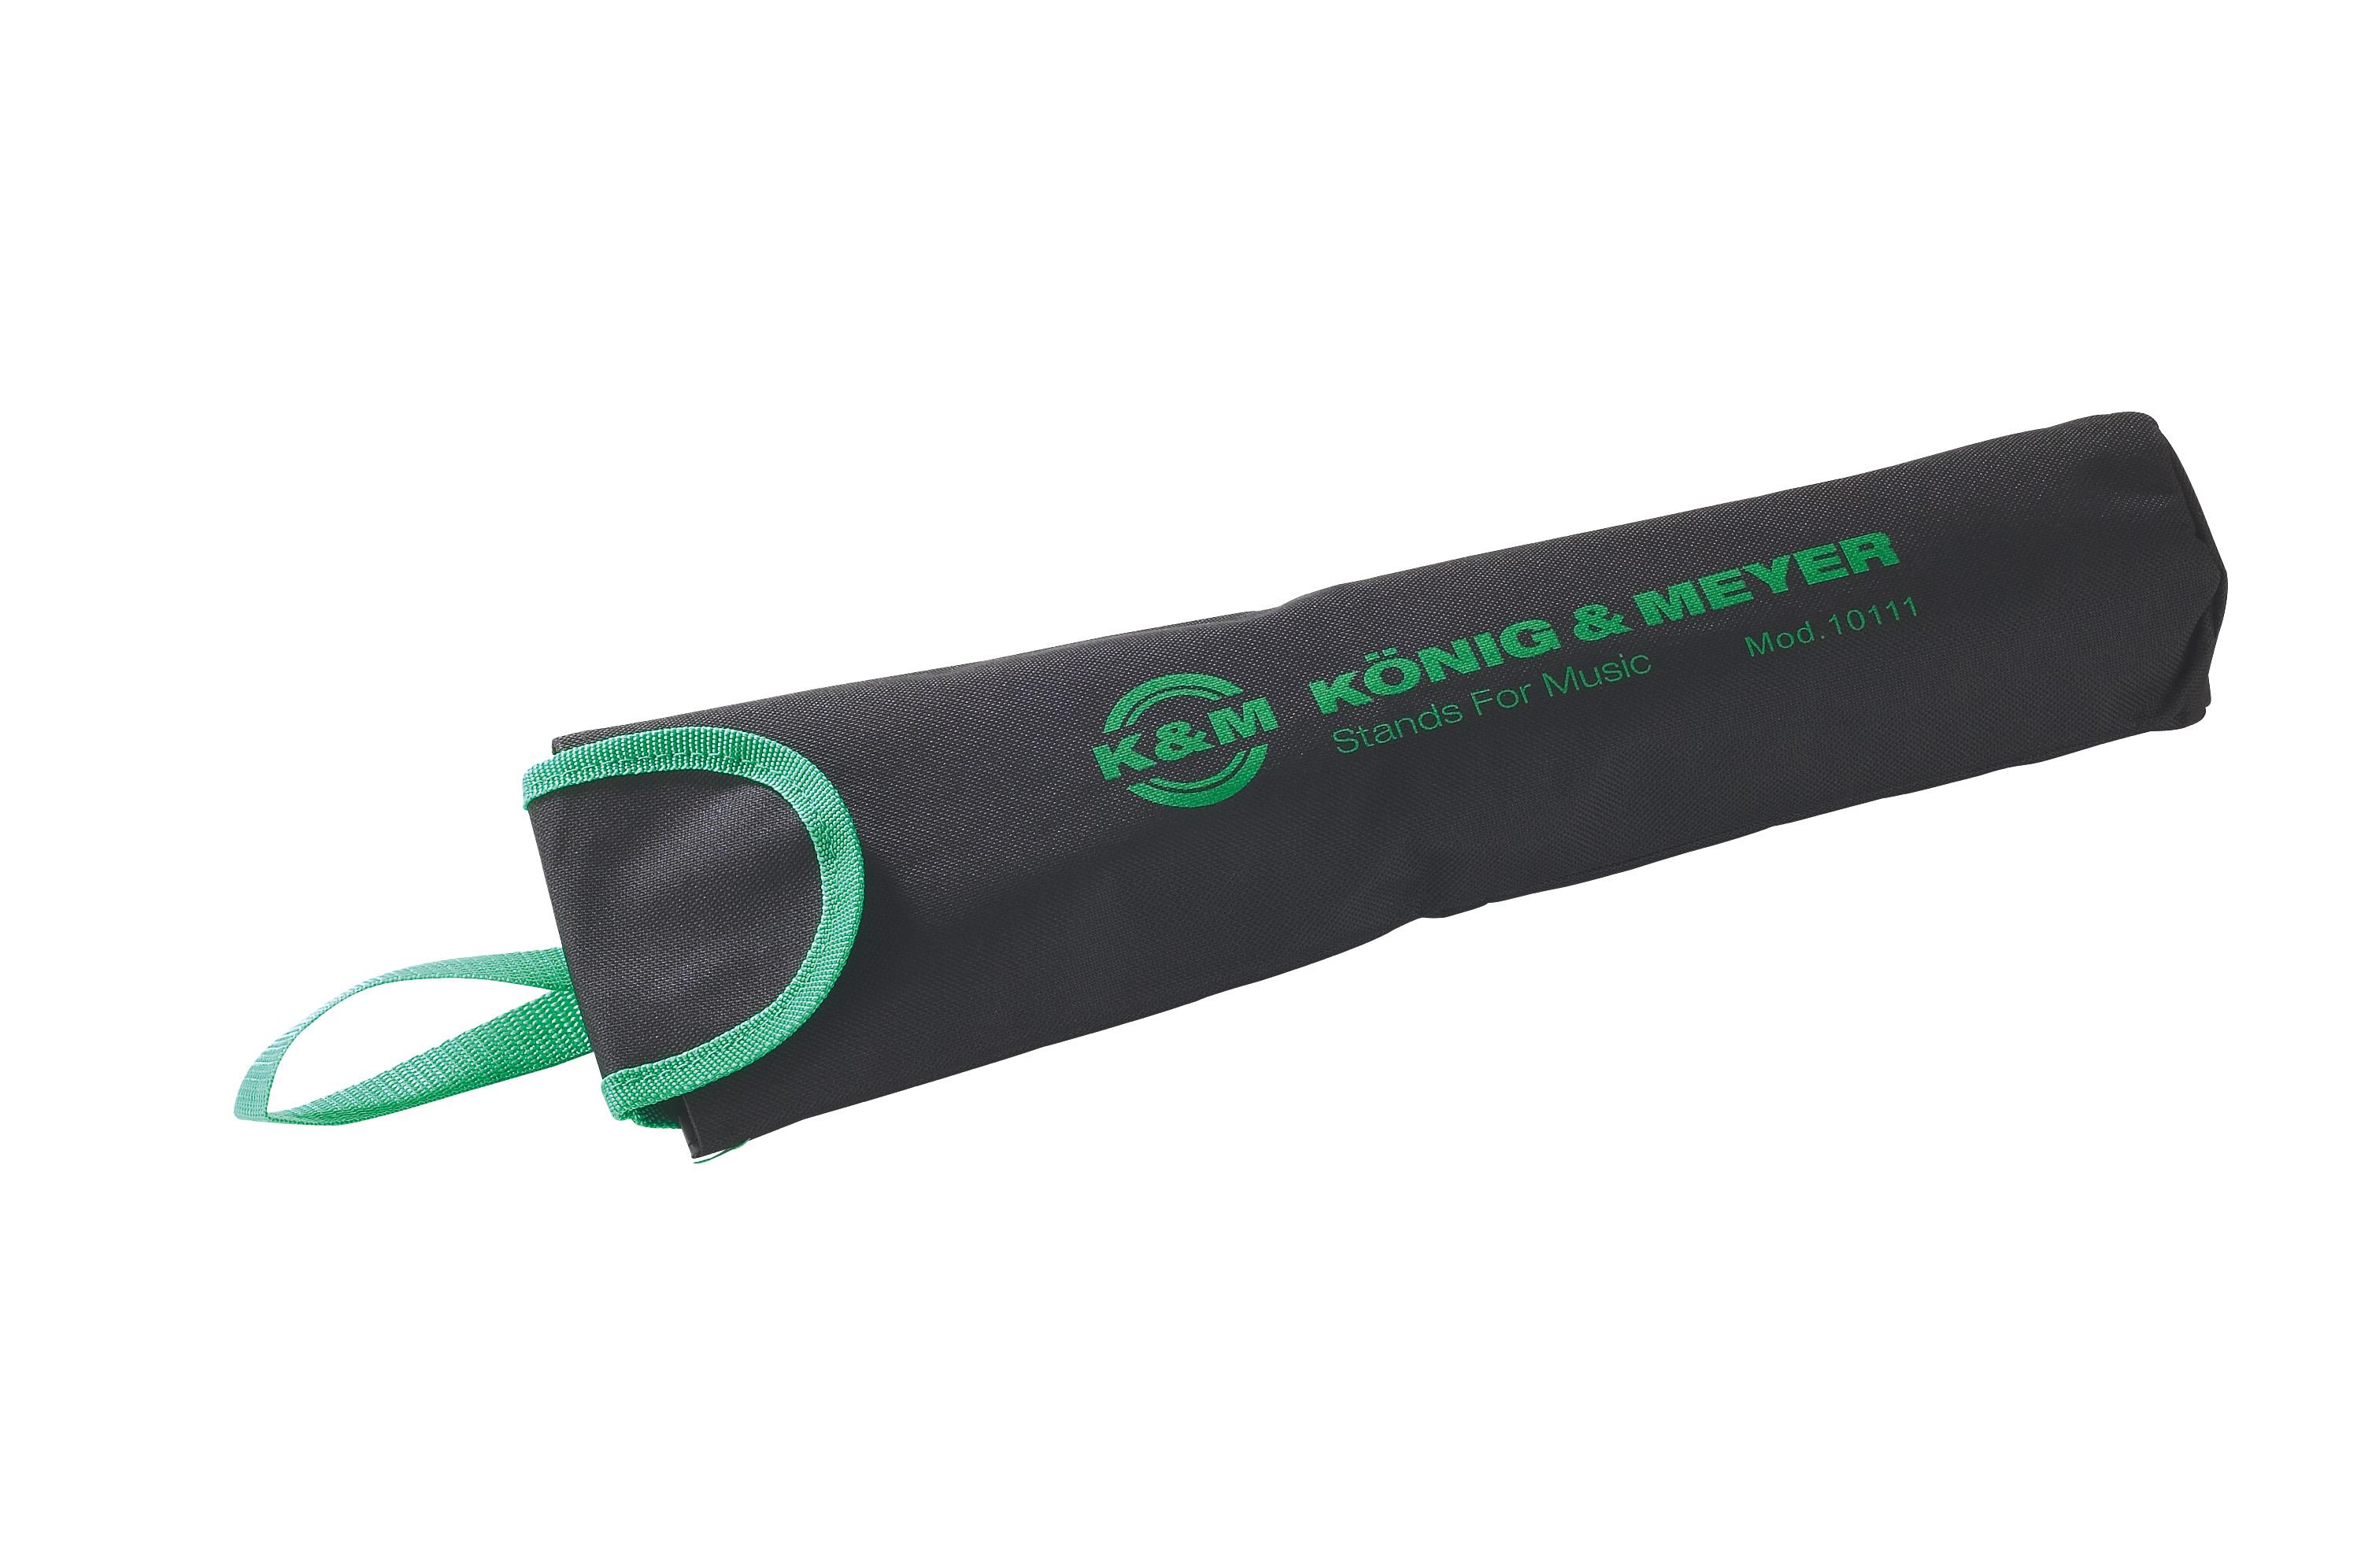 K&M 10111 - Taske til nodestativ model nr 101